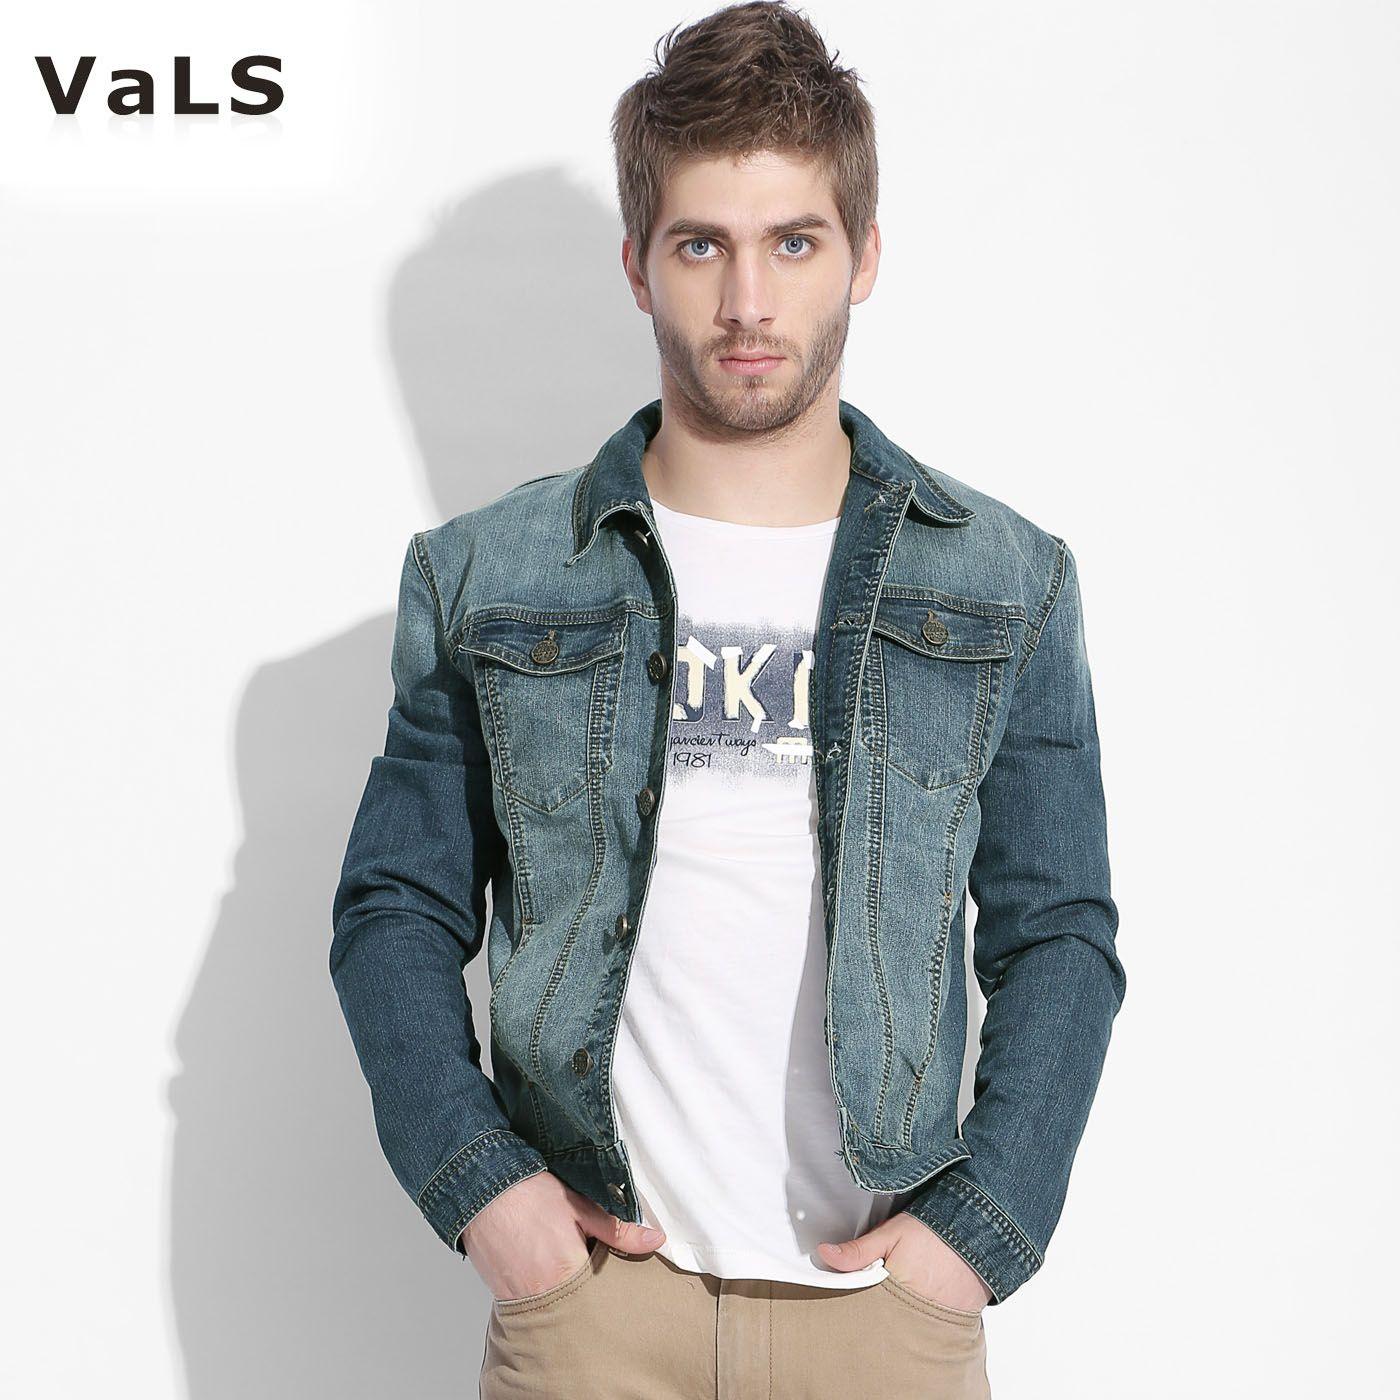 2013 Autumn New Vals Men's Denim Jacket Fashion And High Quality ...